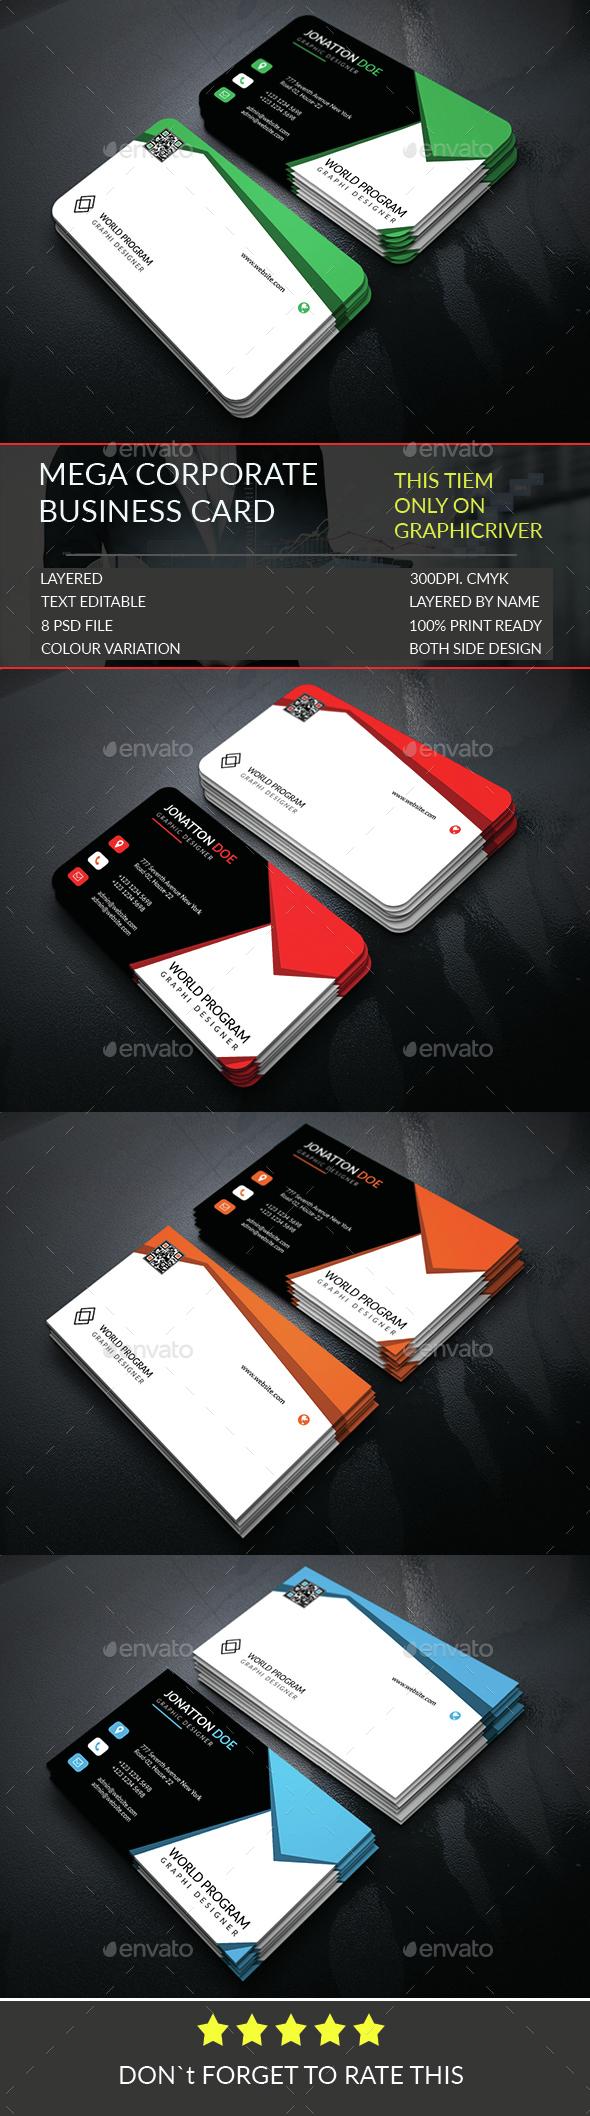 Mega Corporate Business Card Template.307 - Corporate Business Cards